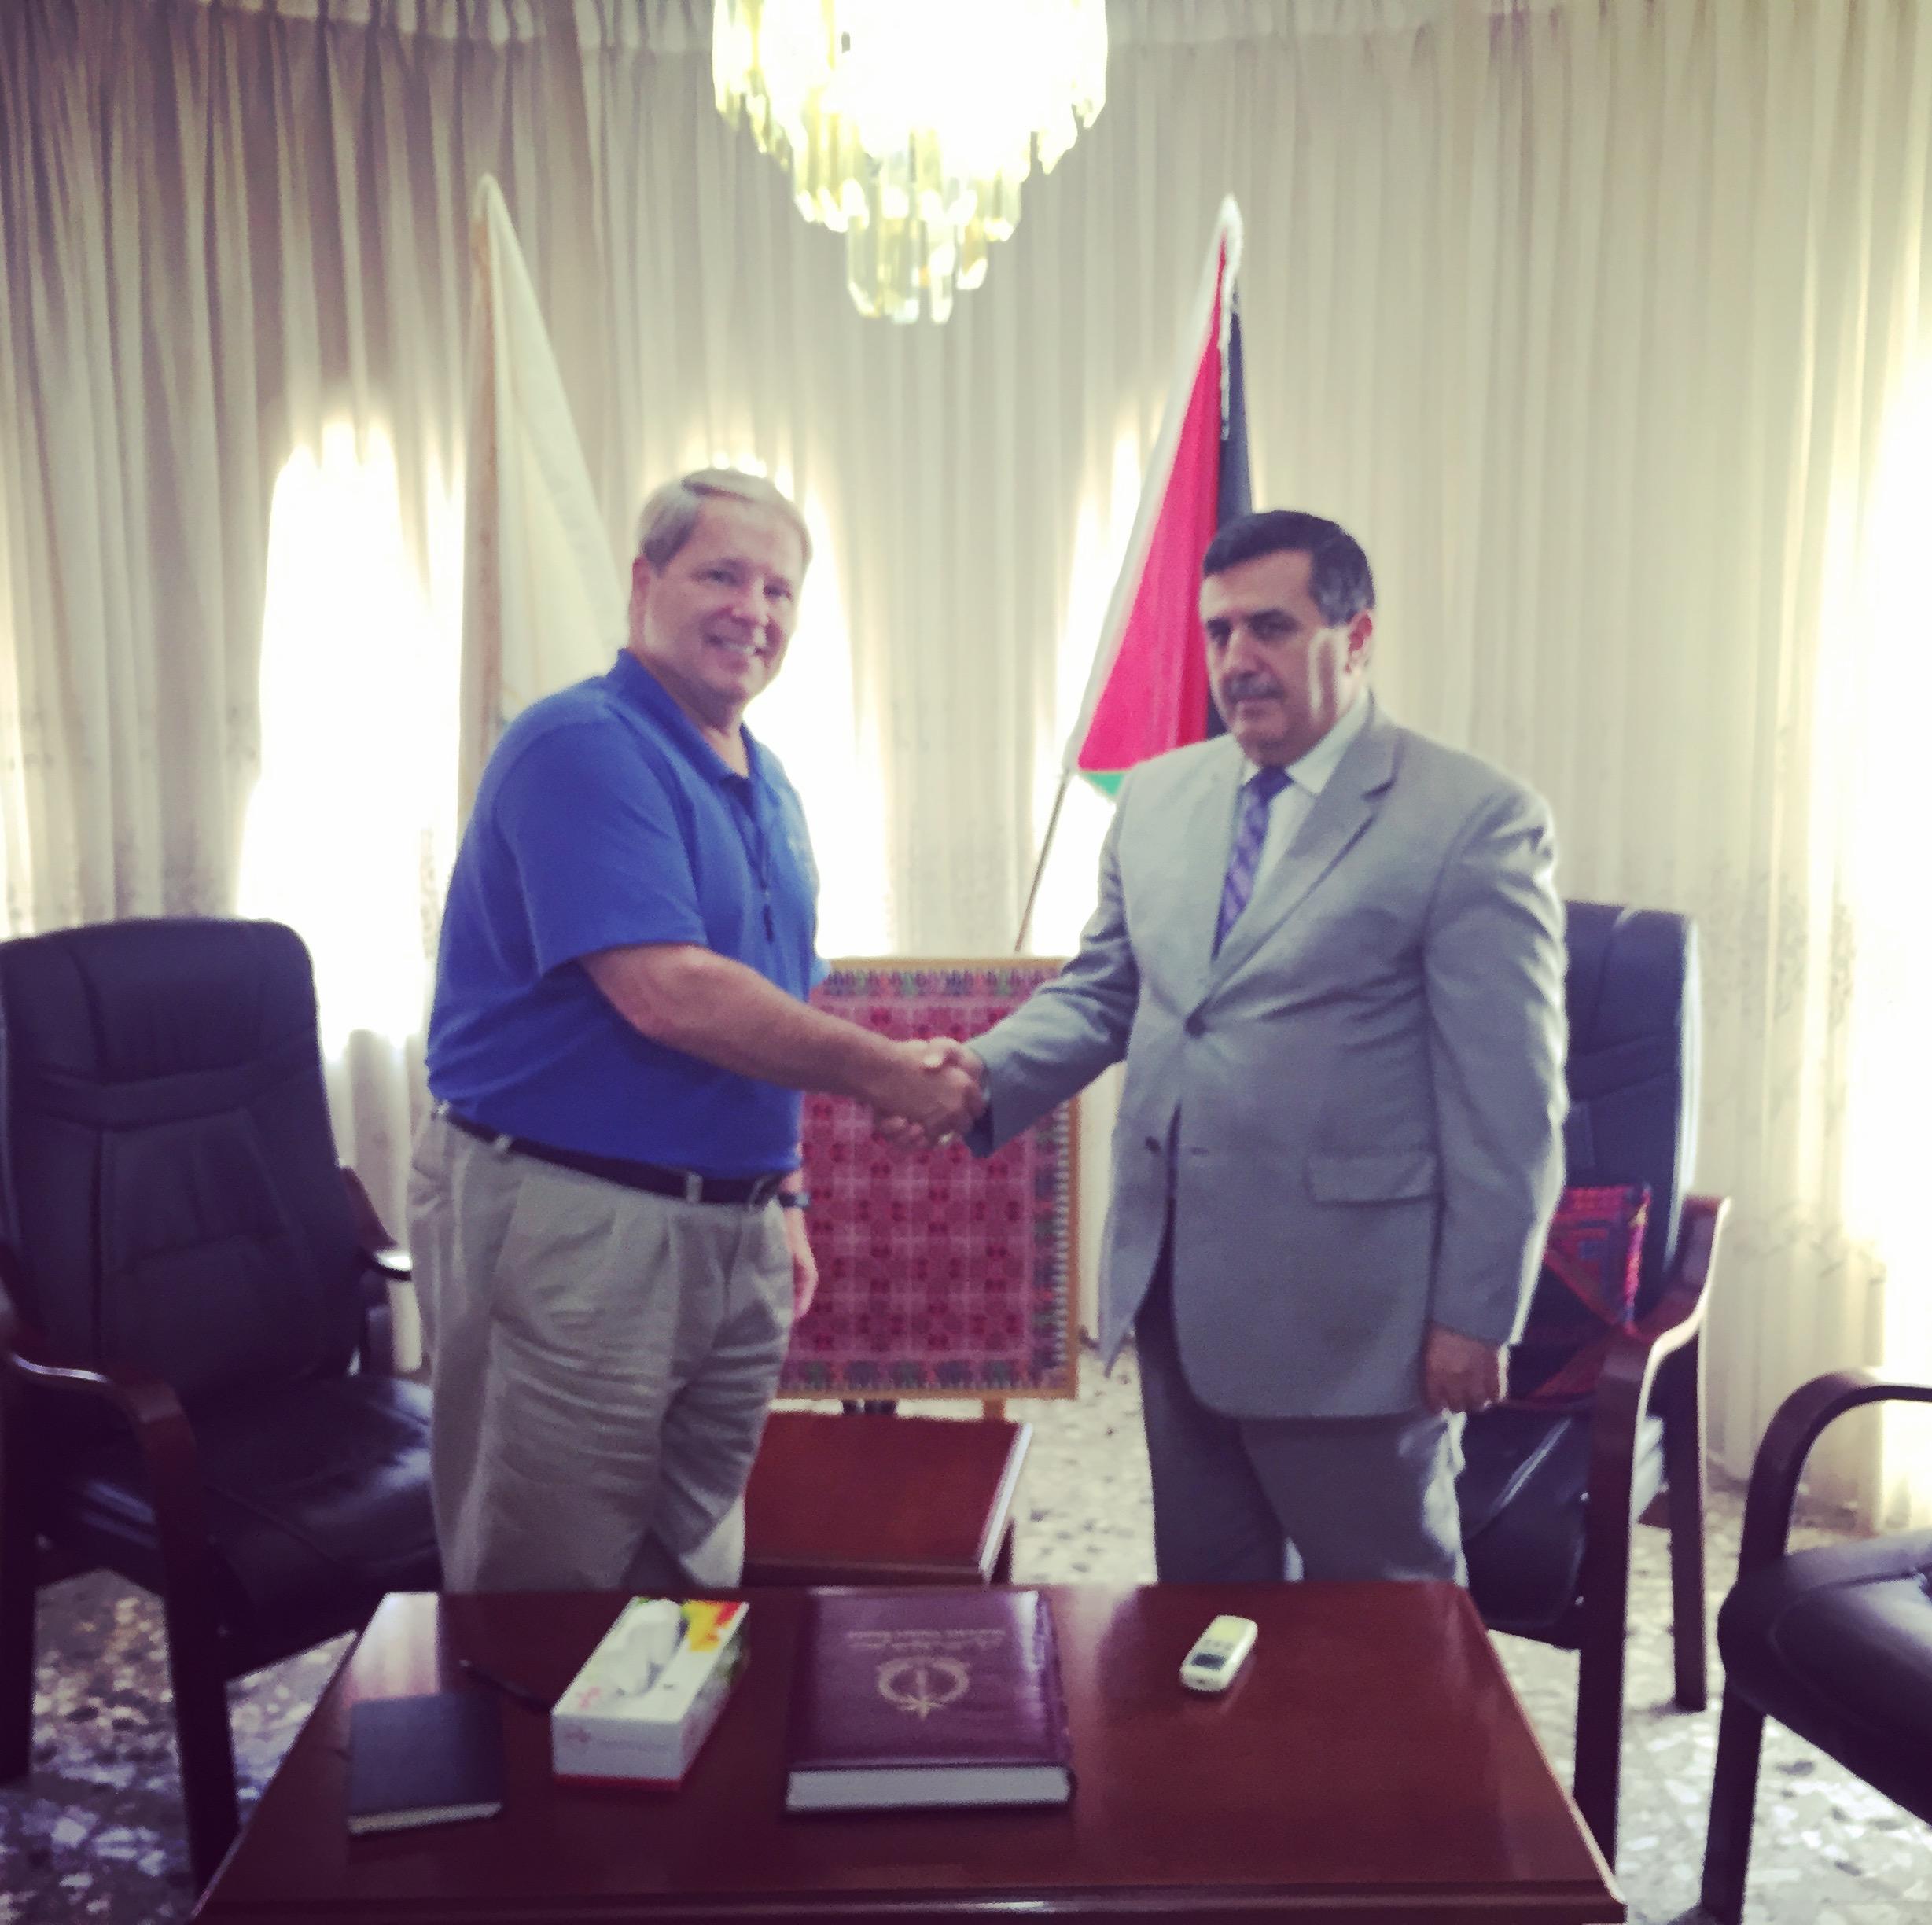 J.R. with the Mayor of Bethlehem, Anton Salaman.